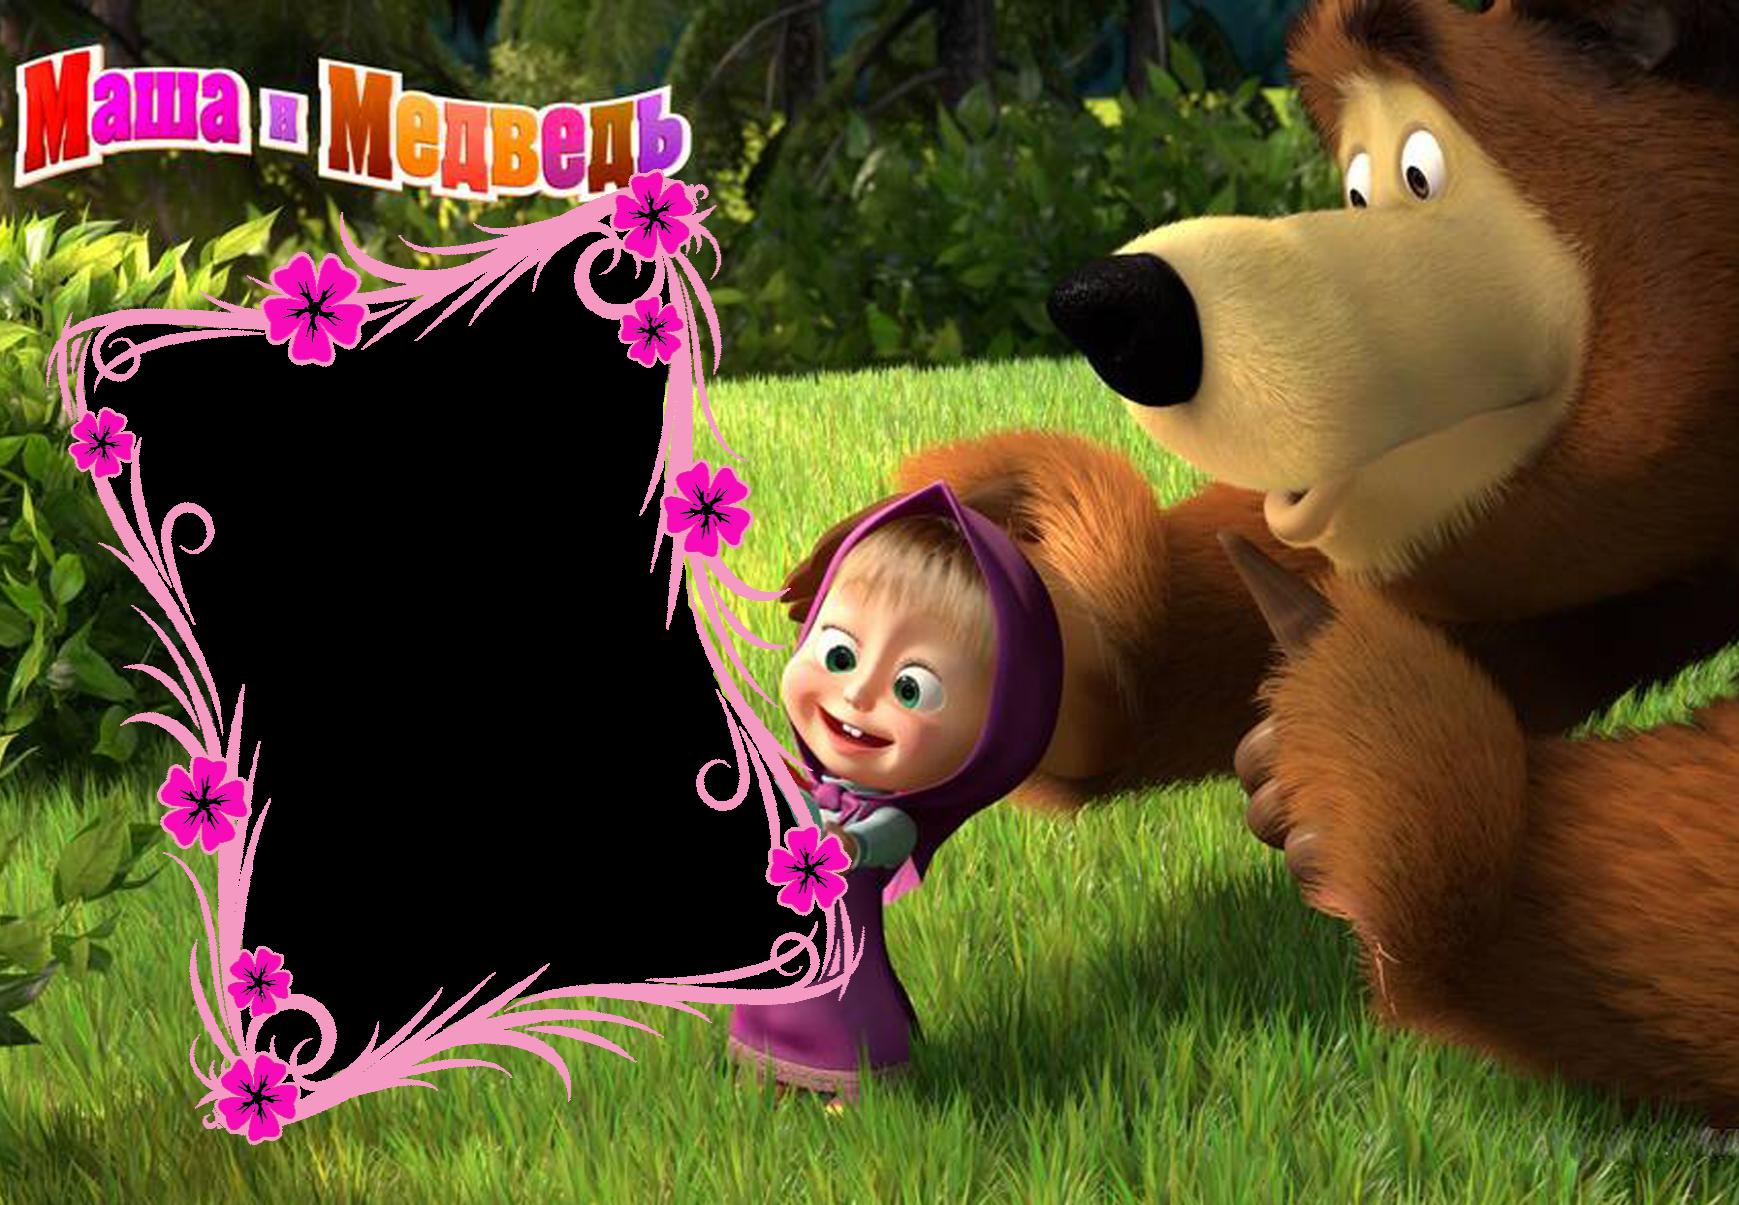 Картинки или открытки маши и медведя, открыток квиллинг